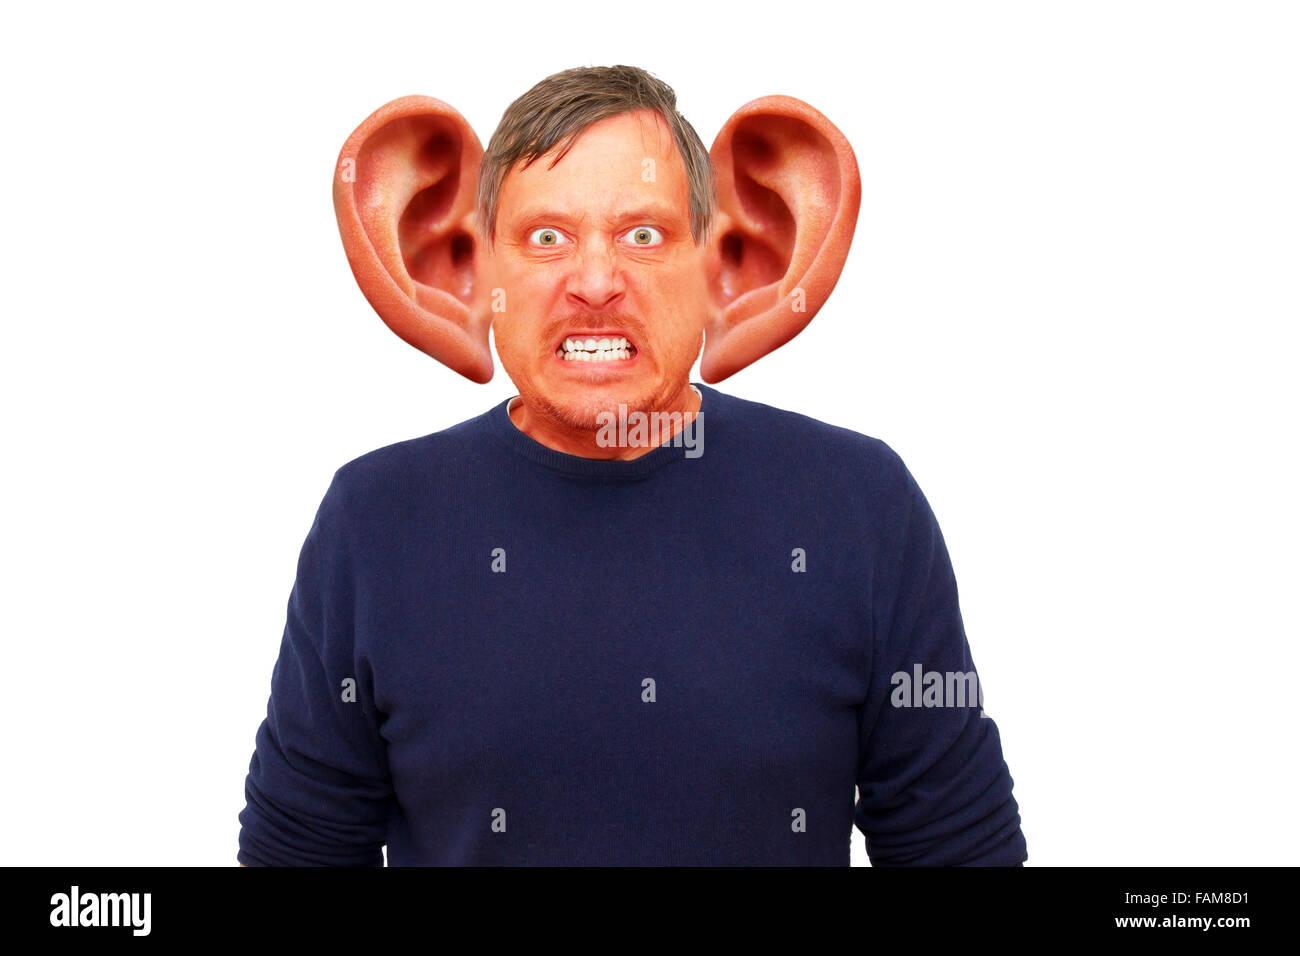 Angry man with funny big ears - Stock Image